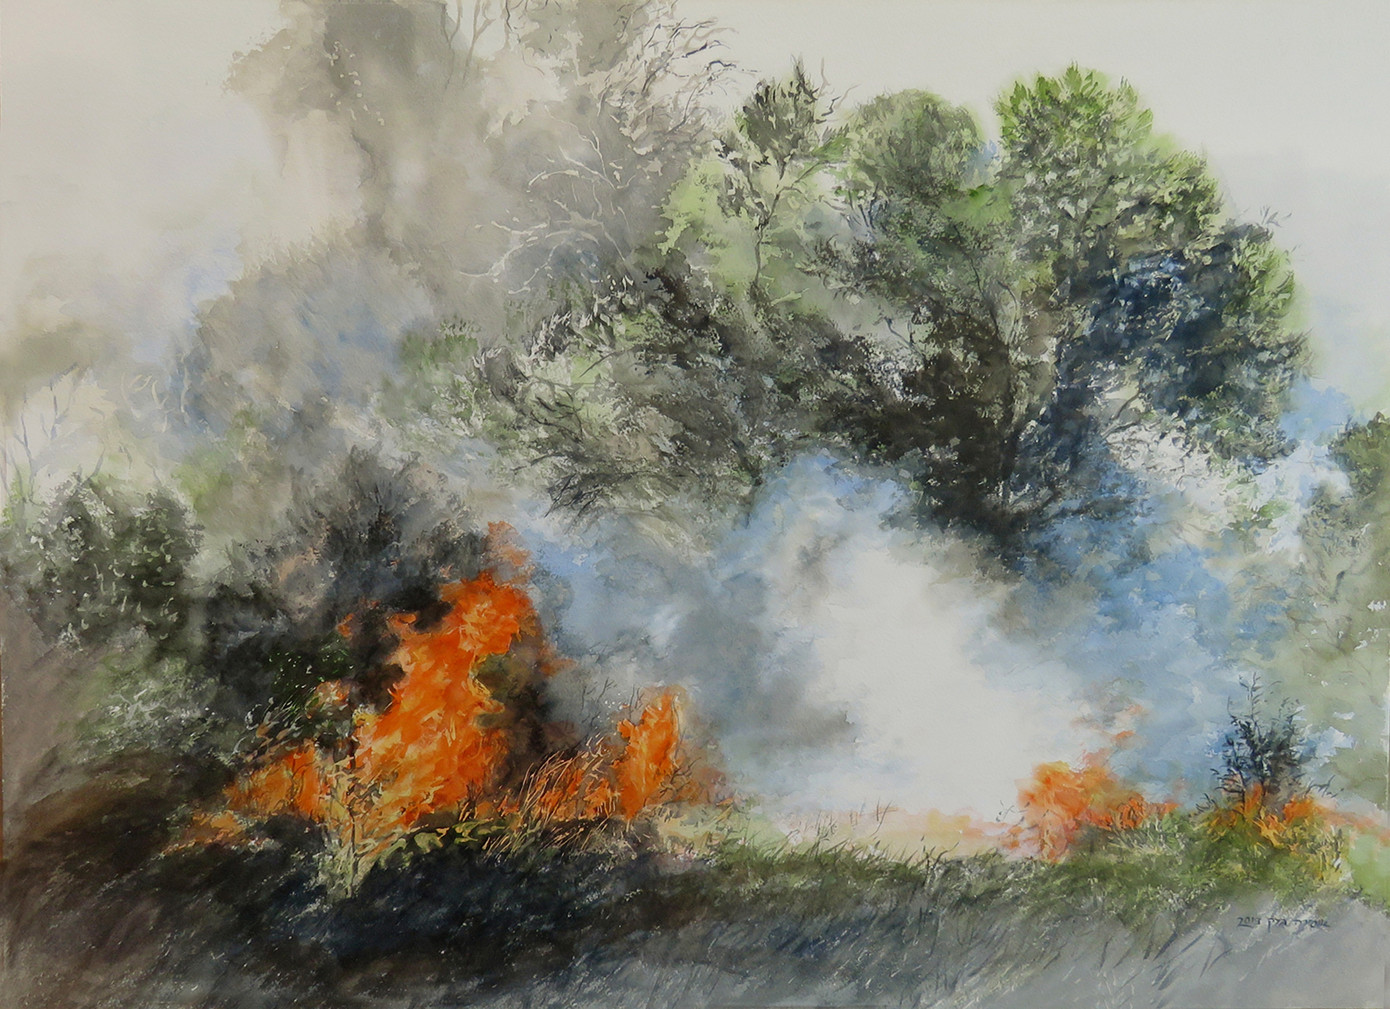 Fire-Watercolor- 73X53cm-2019